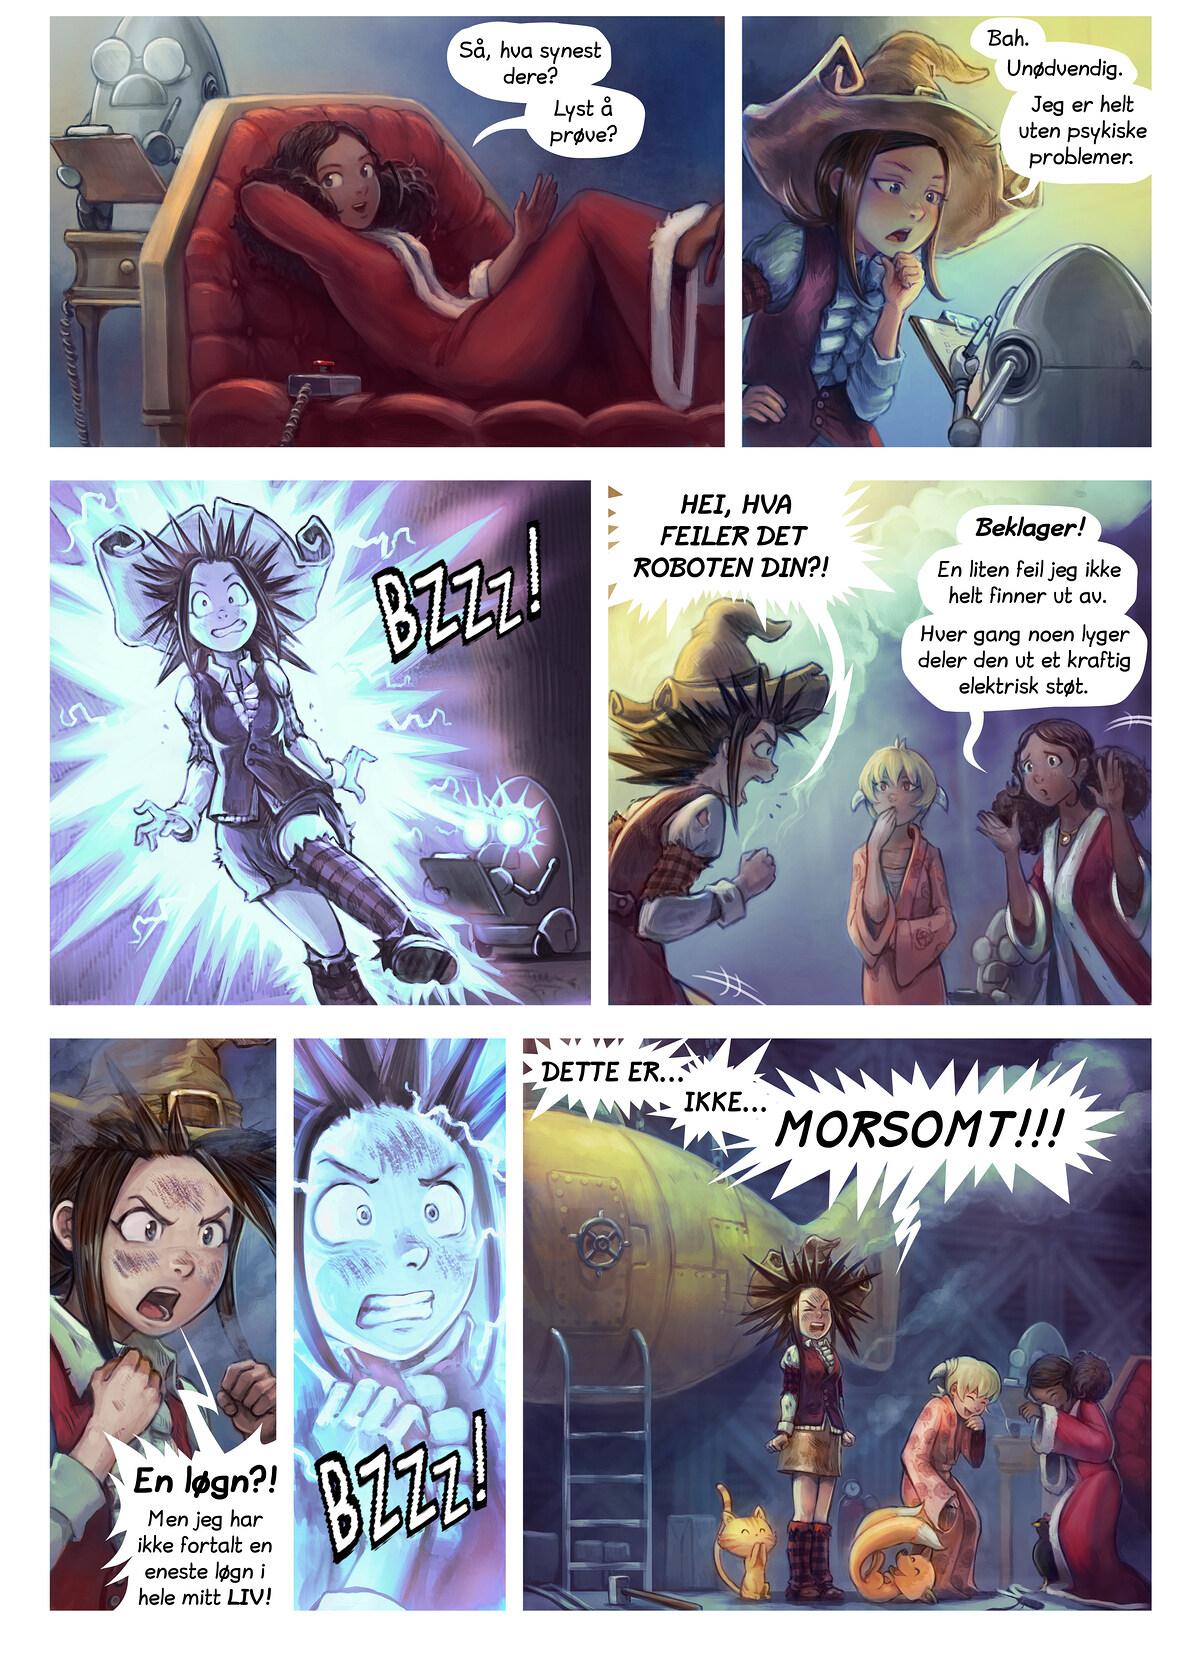 Episode 27: Korianders oppfinnelse, Page 4